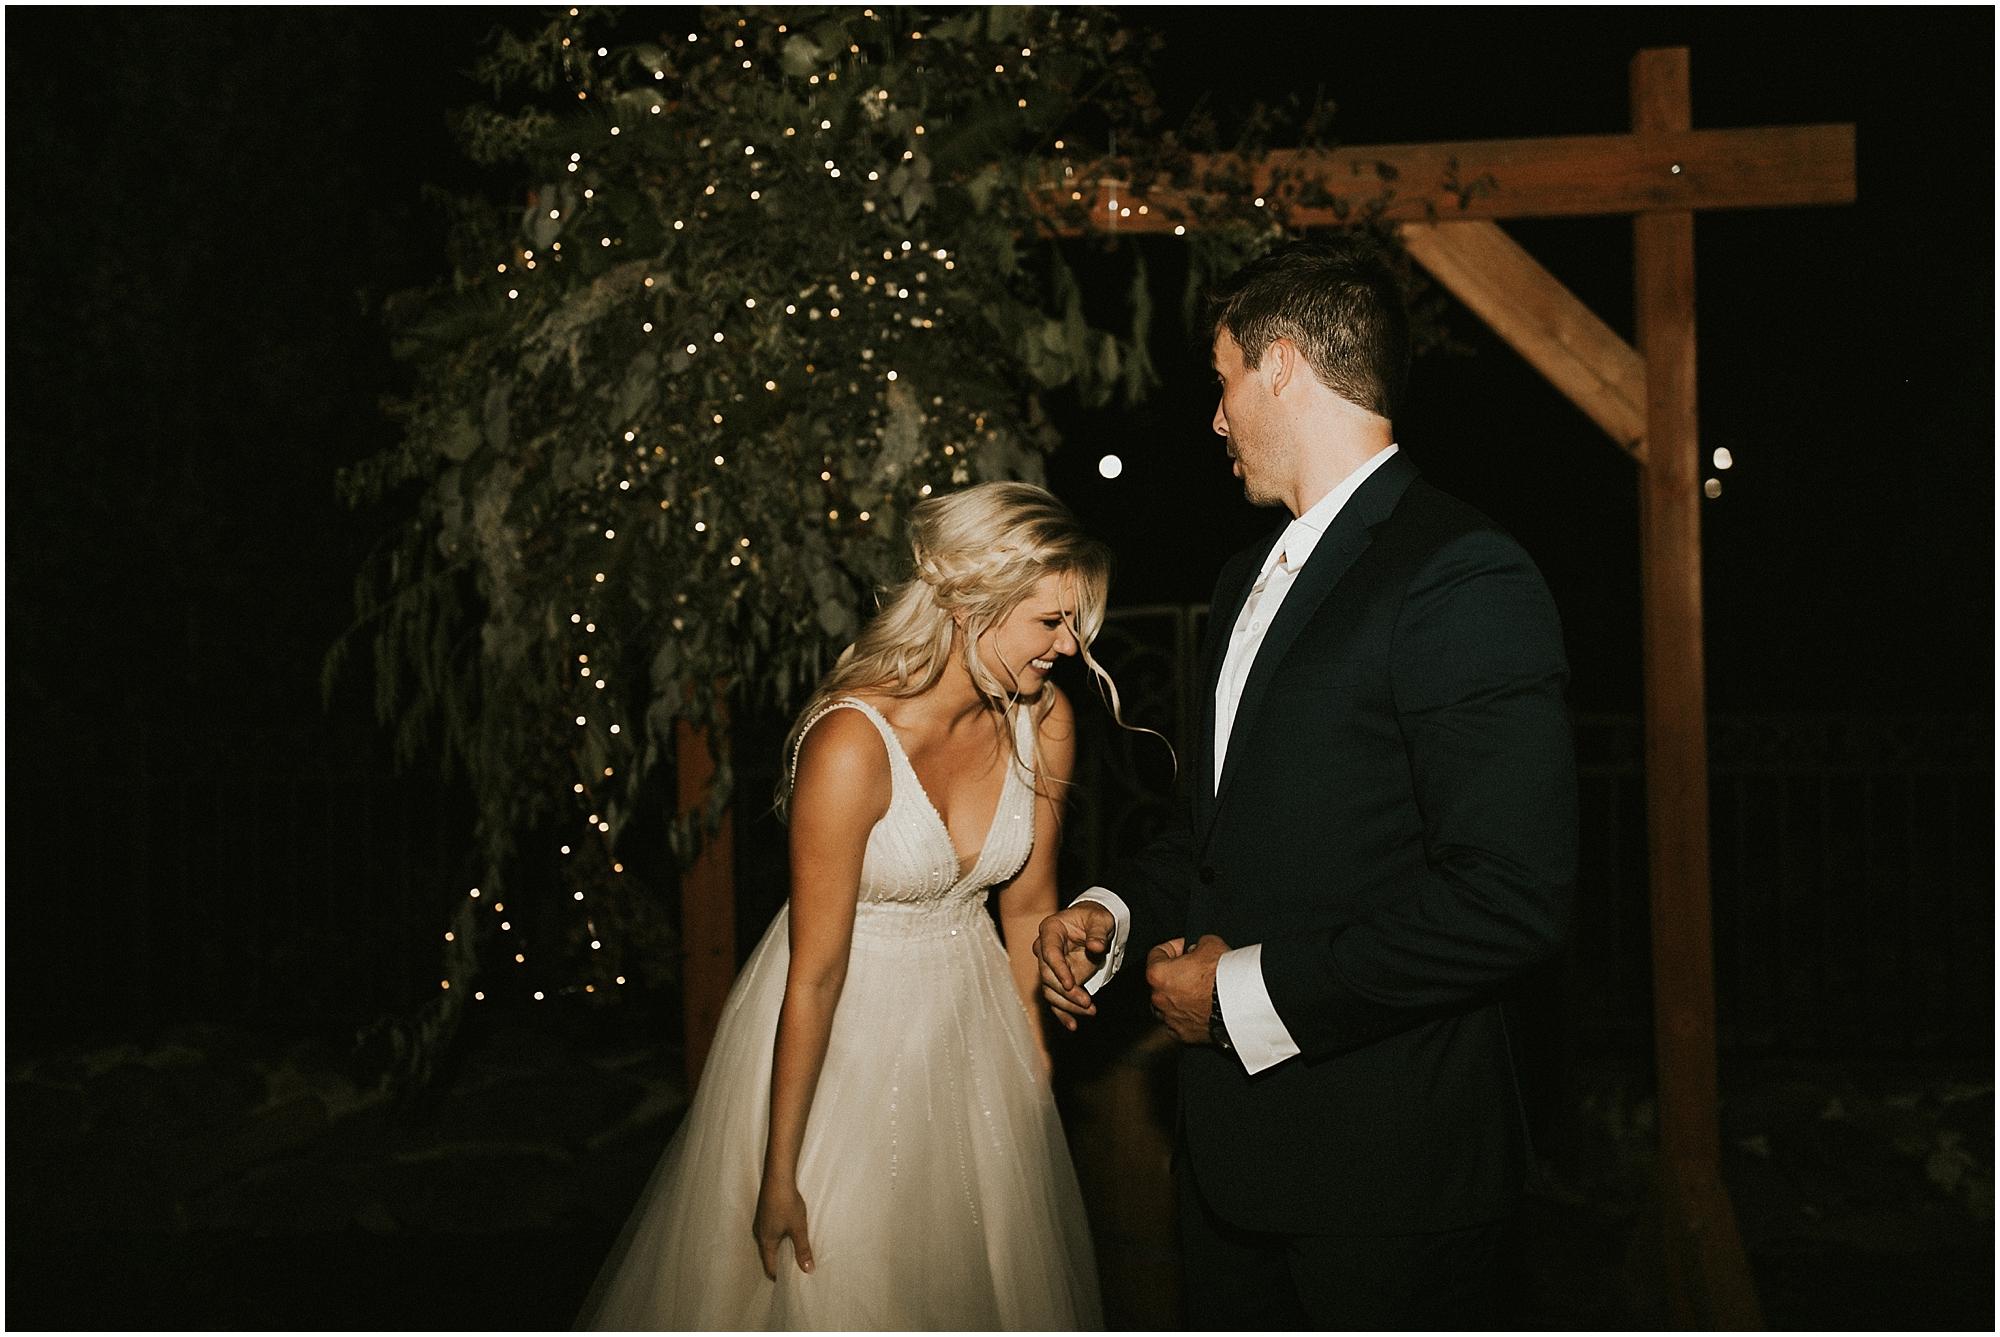 Chateau Rive Spokane Wedding Cassie Trottier Photography1169.jpg